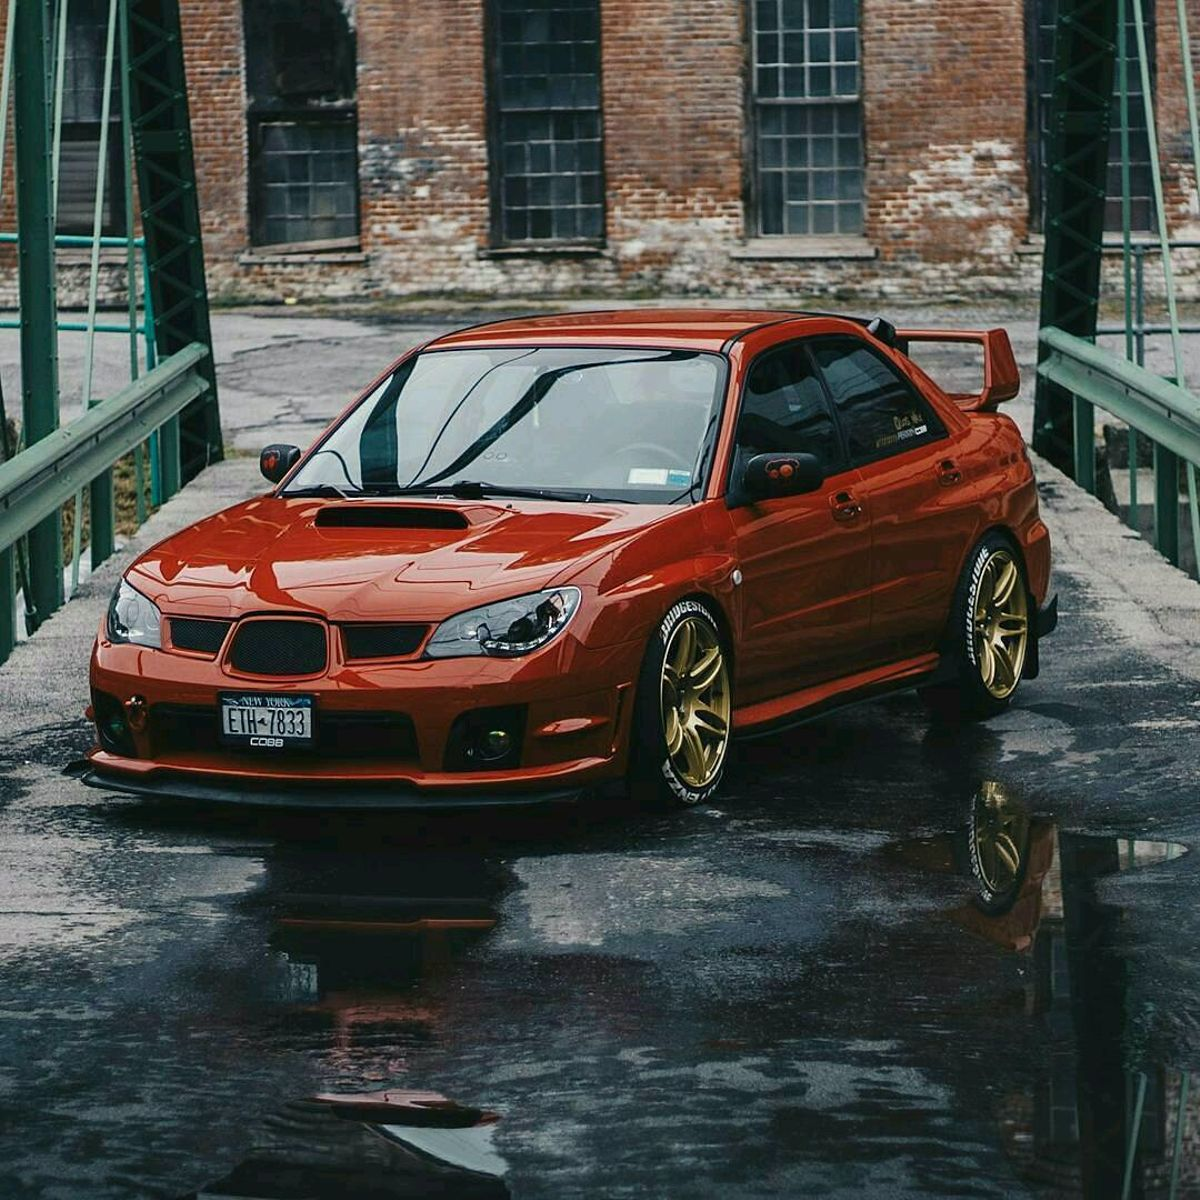 JDM/Japanese Car Wallpapers